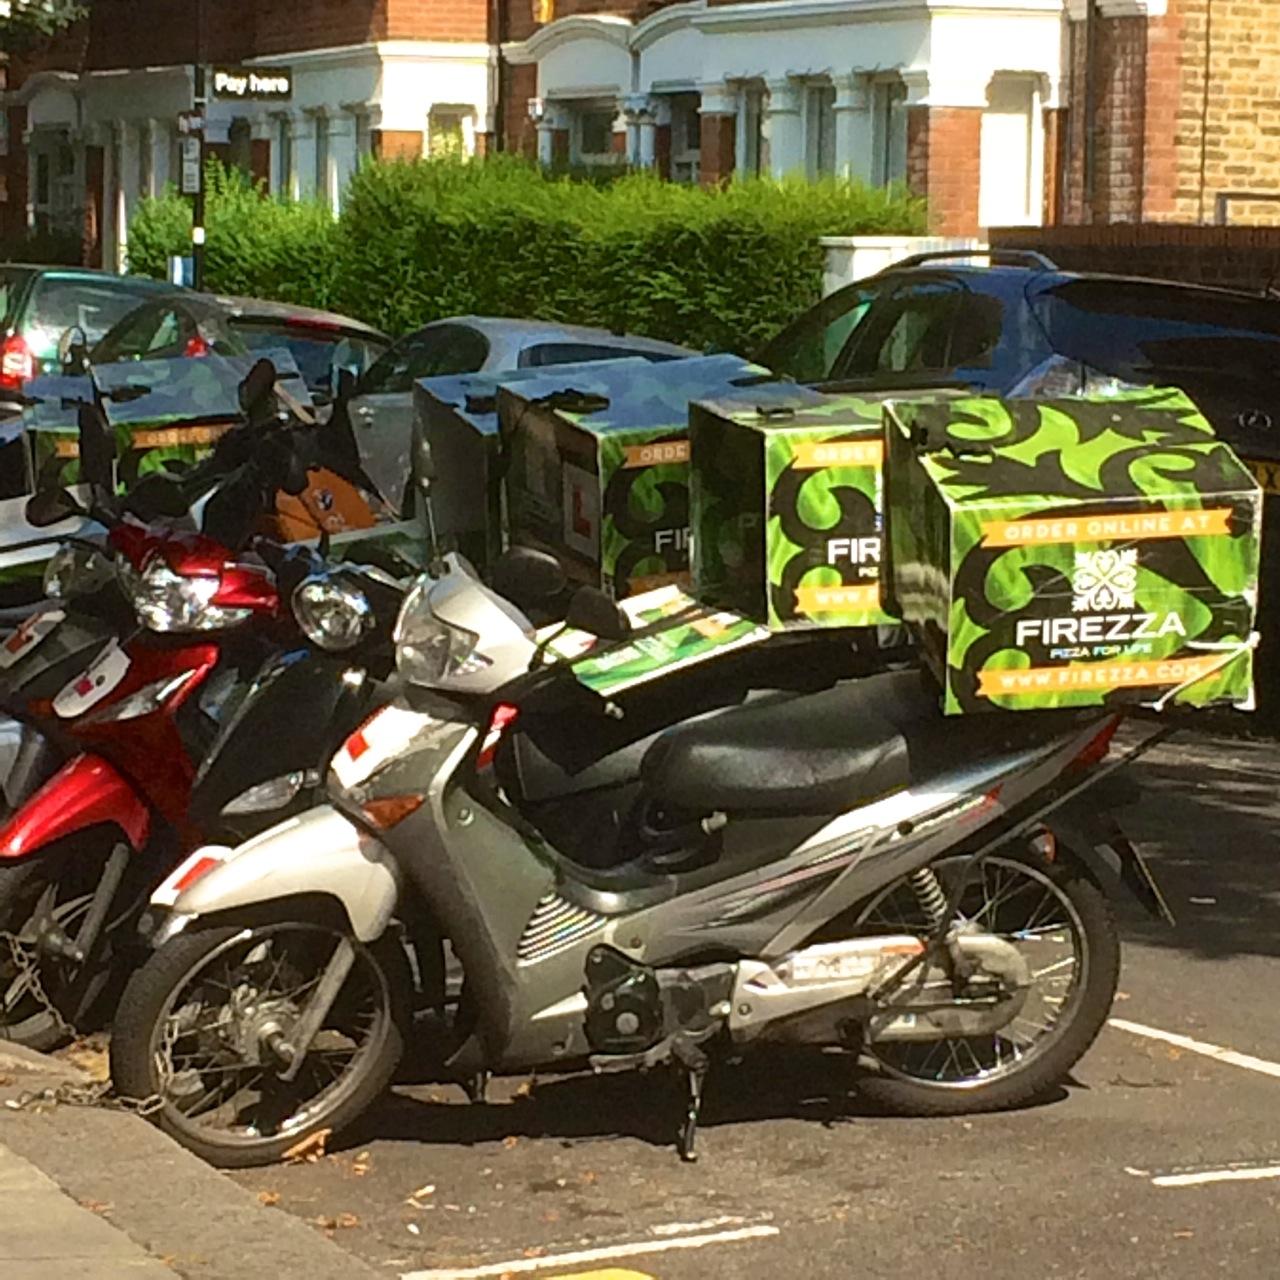 http://i0.wp.com/fatgayvegan.com/wp-content/uploads/2015/09/Delivery-motorcycles.jpg?fit=1280%2C1280